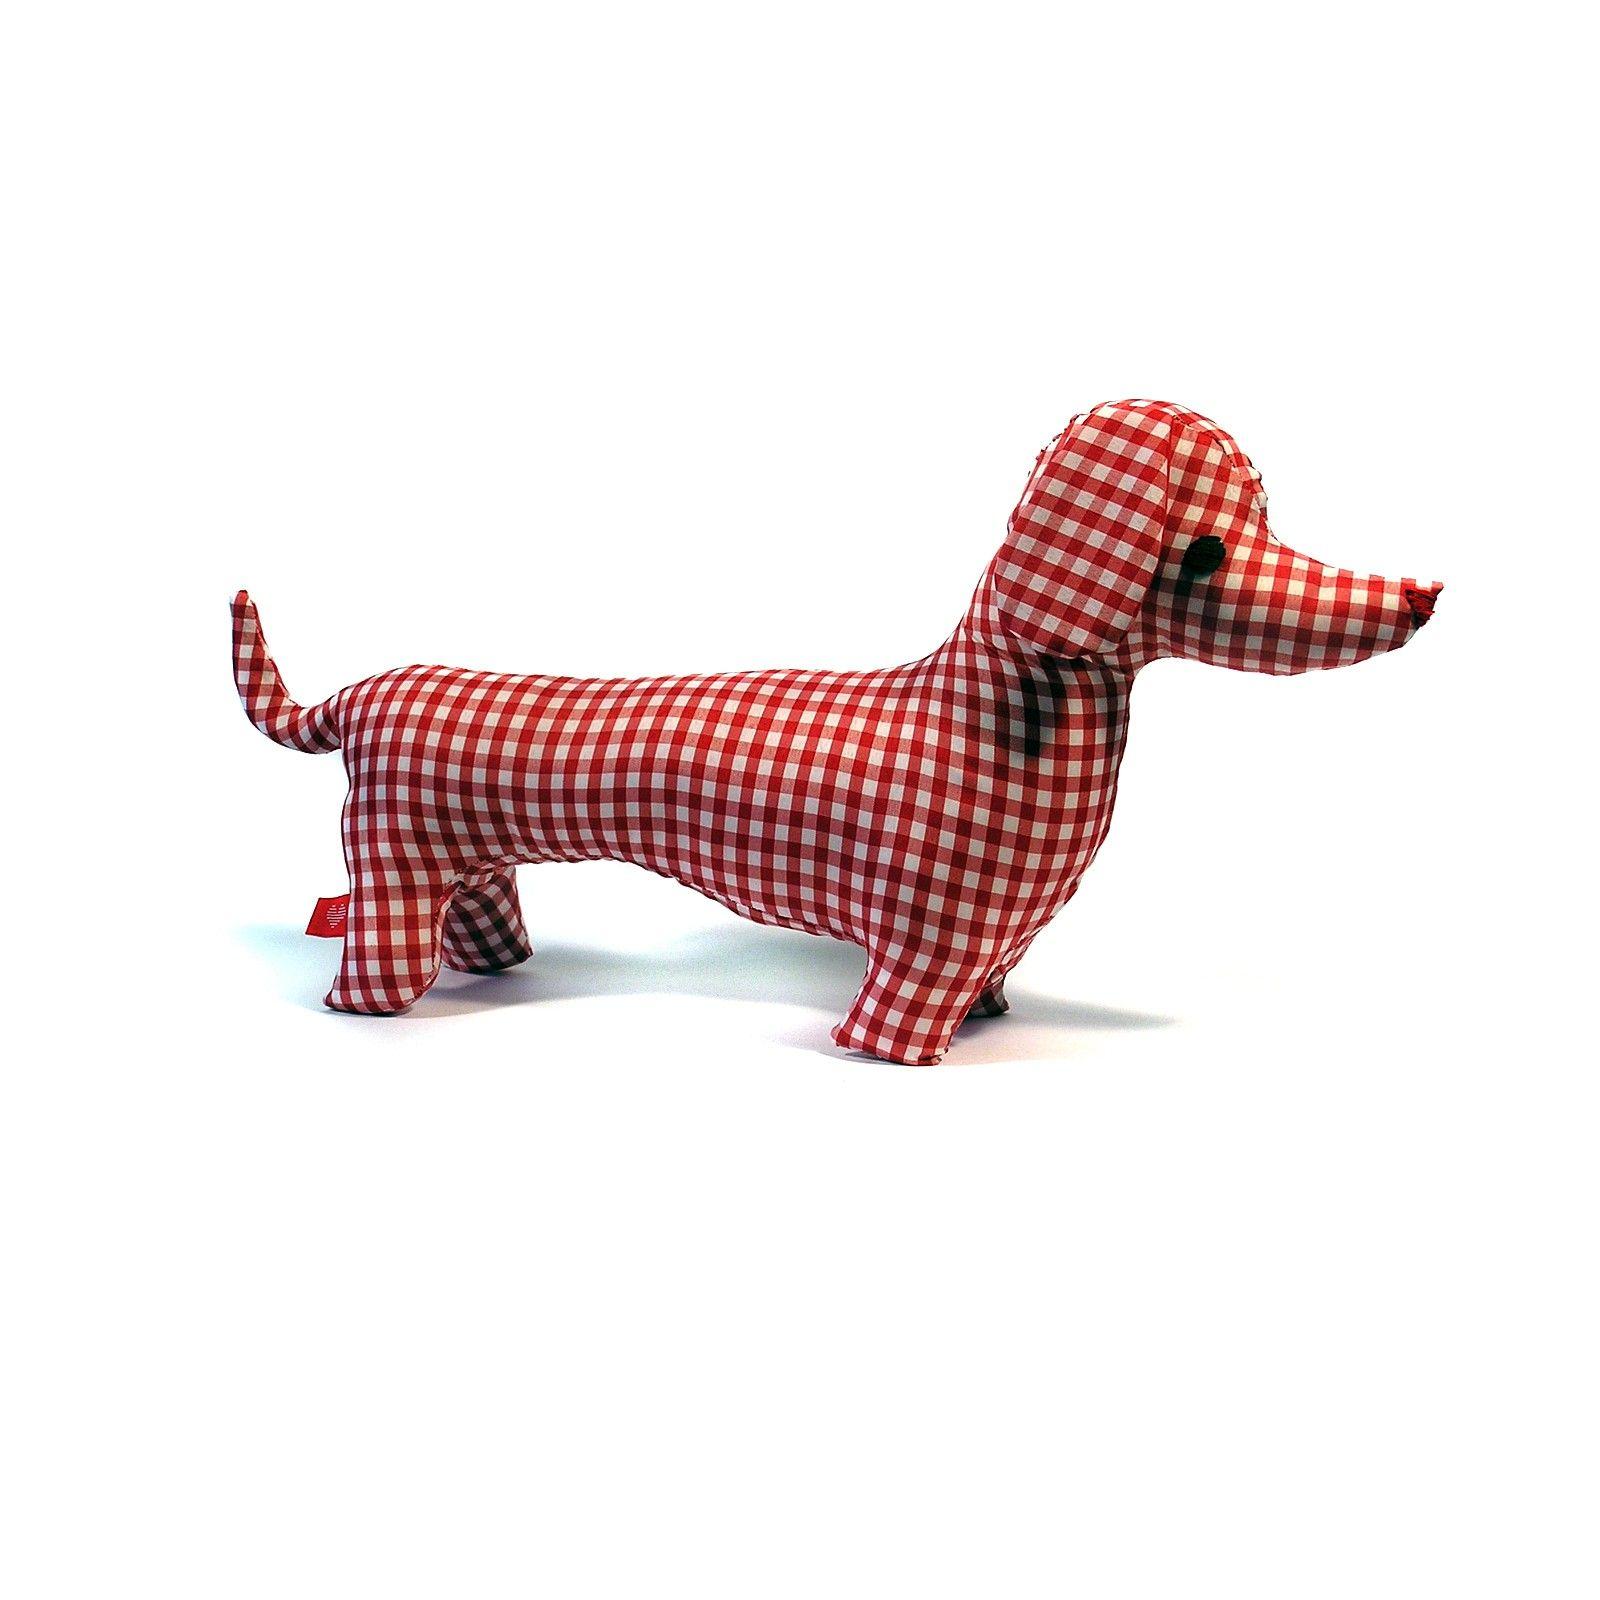 Muñecos de Trapo perro salchicha a cuadros rojo | Muñecos de Trapo ...